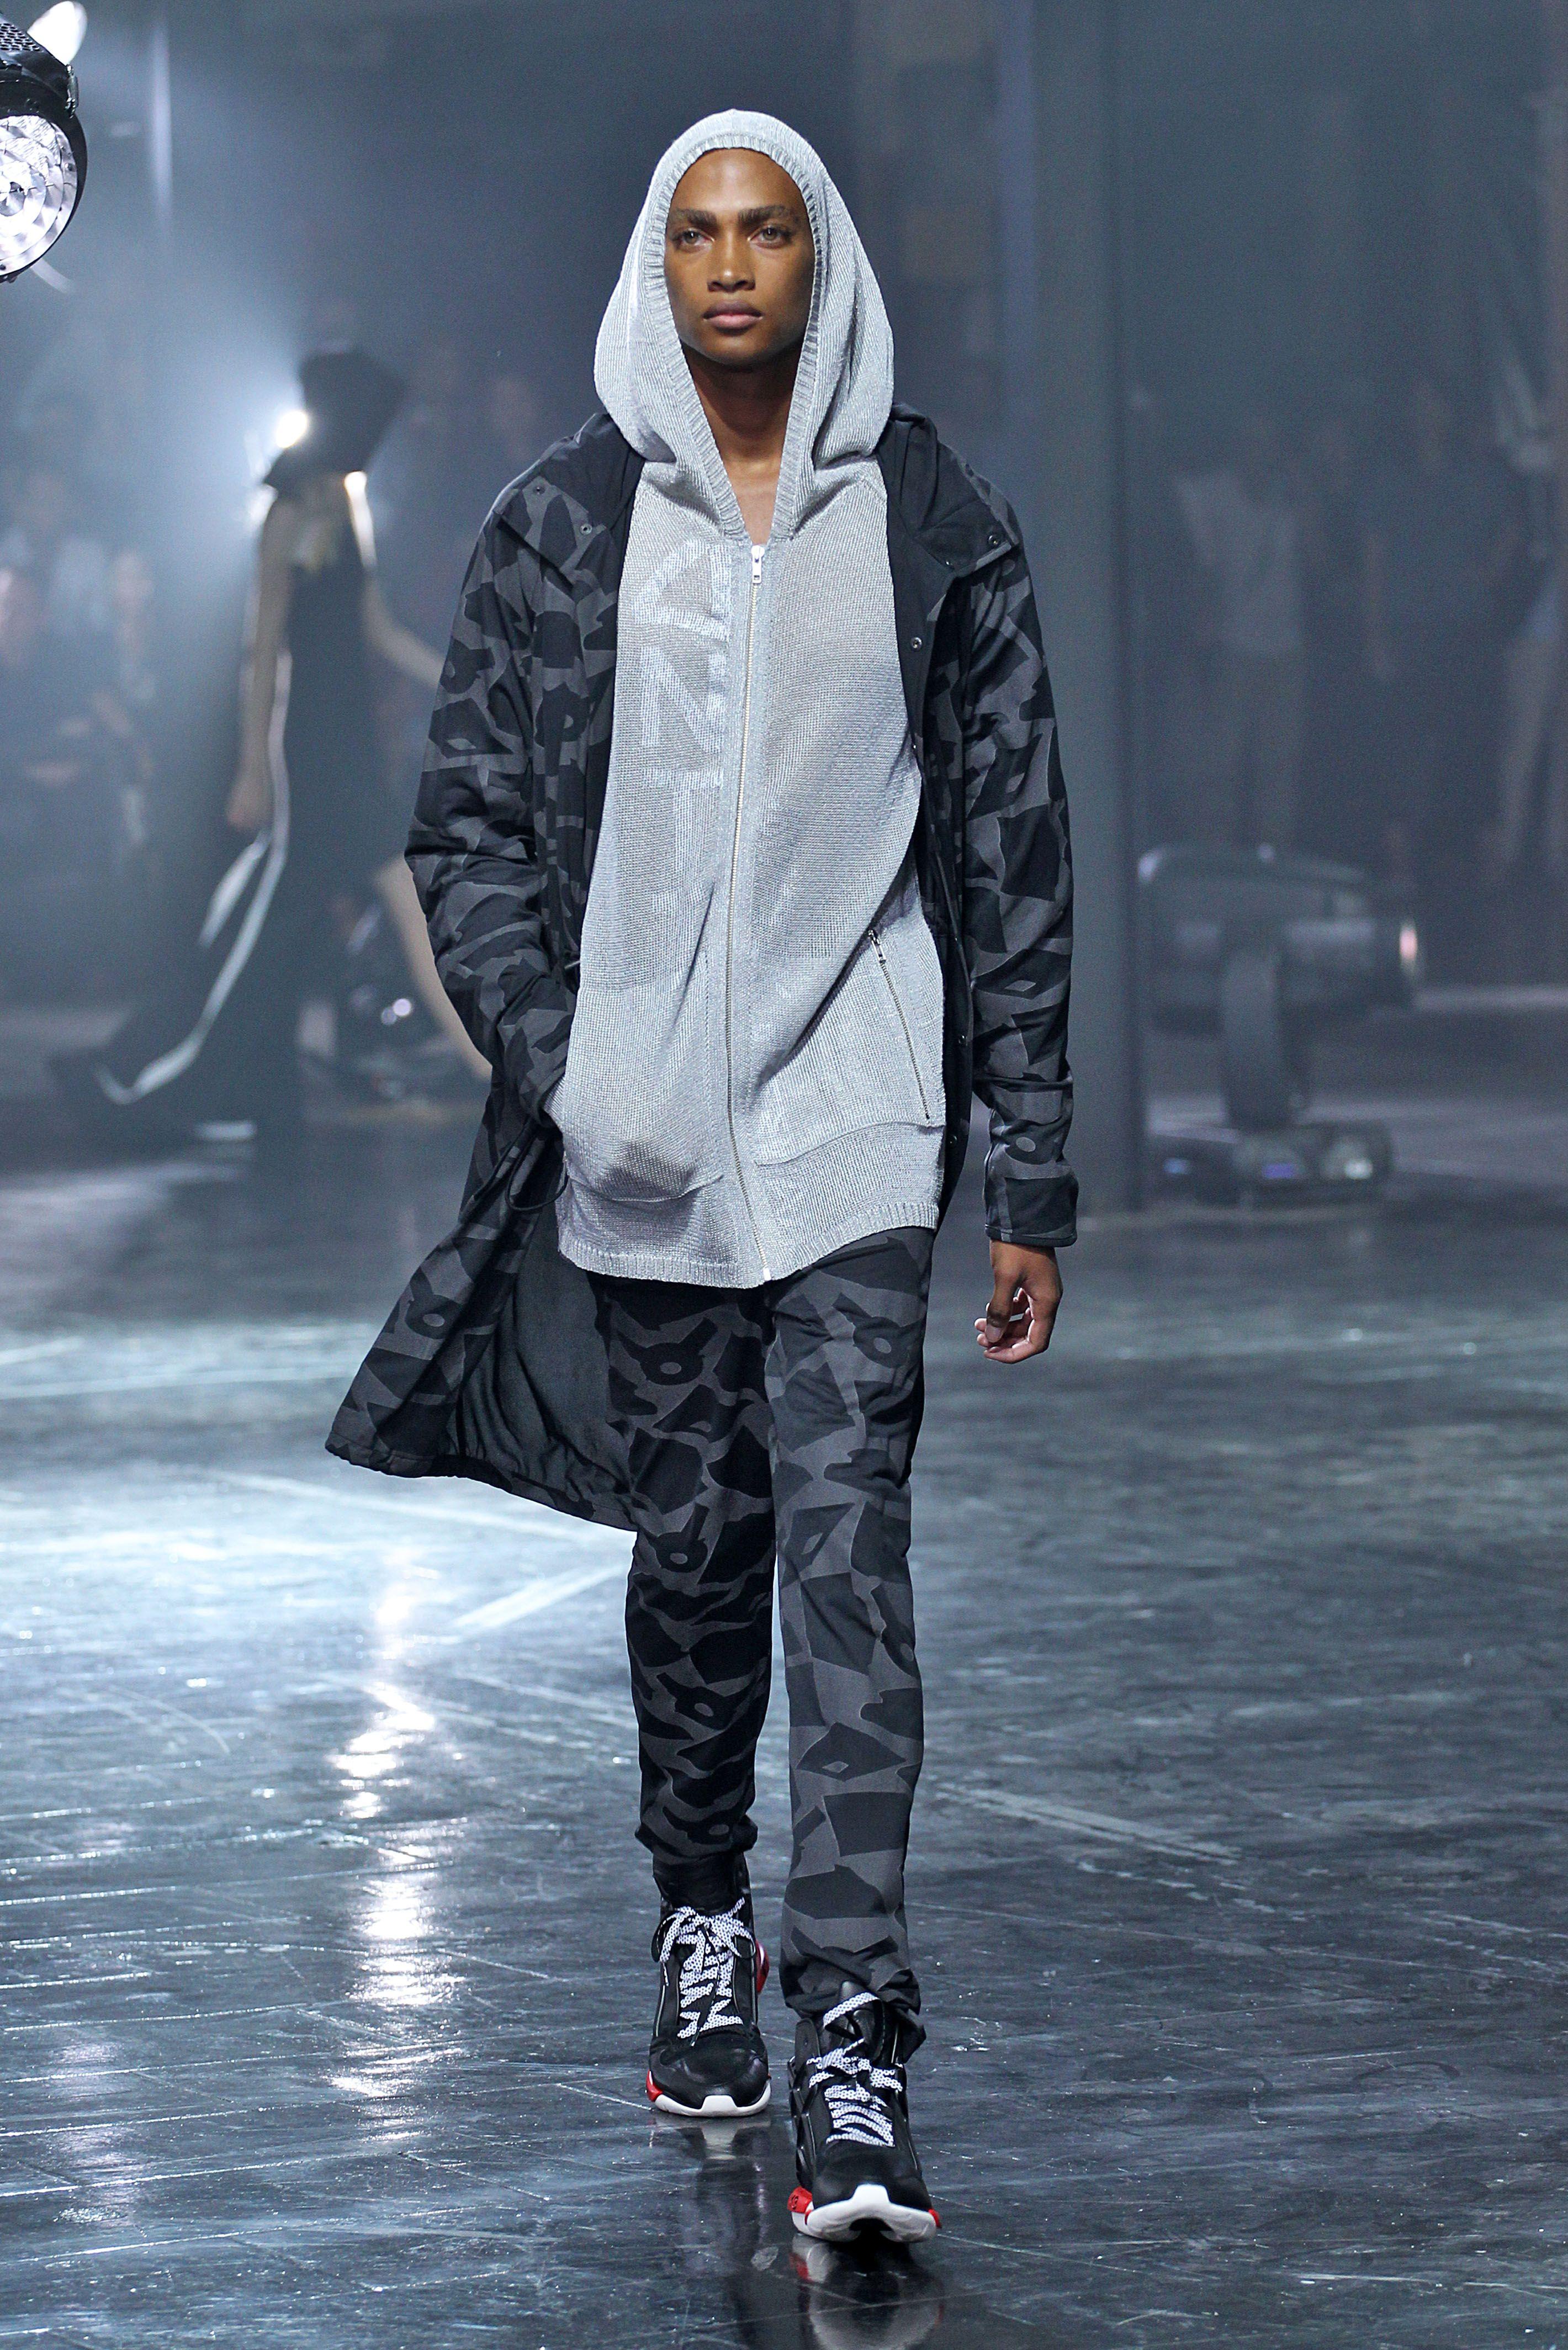 @y-3 S/S 2014 Men's Runway Looks #adidas #Y3 #Y3show #NYFW #meaninglessexcitement #PeterSaville